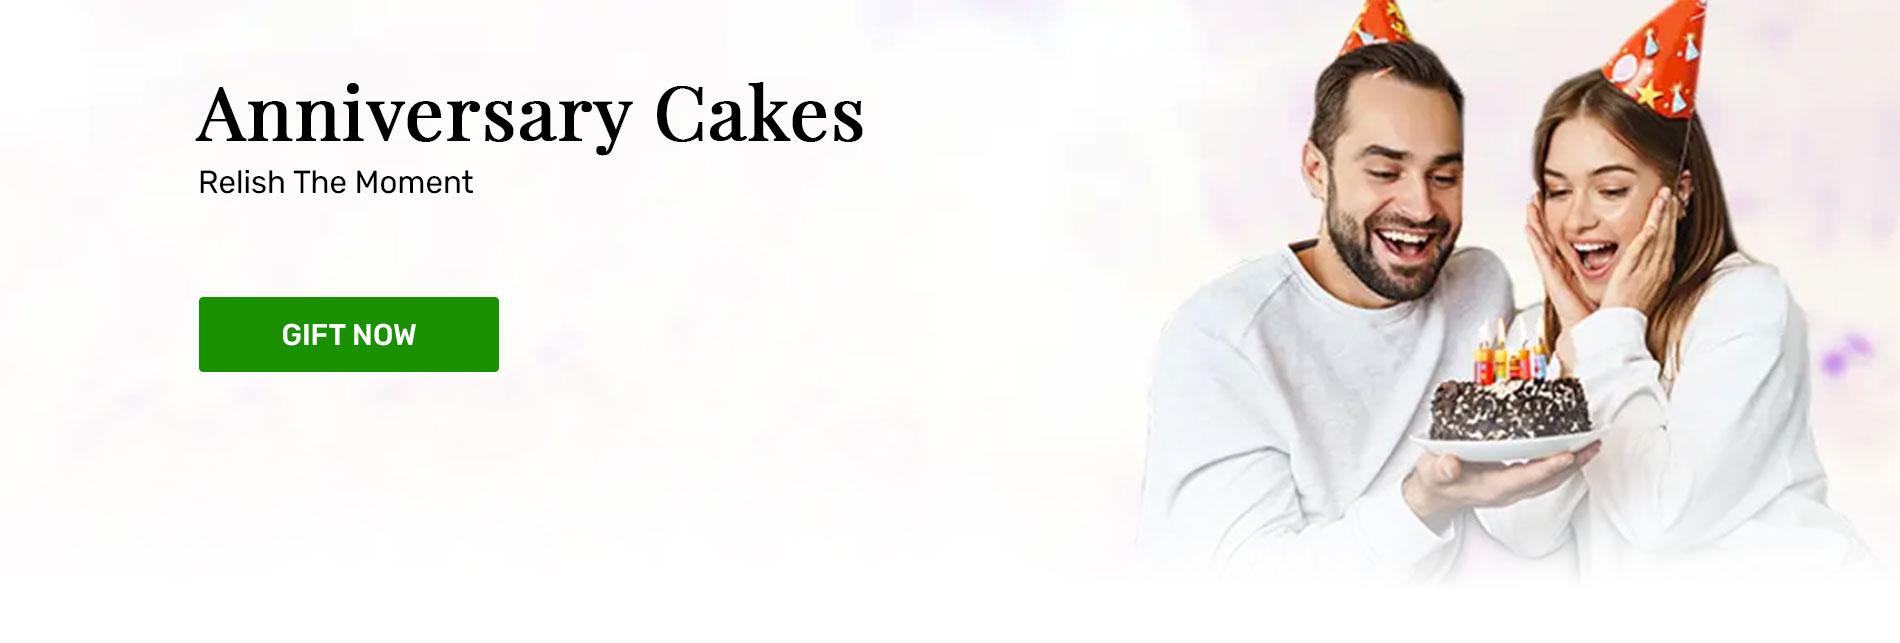 Send anniversary cakes online